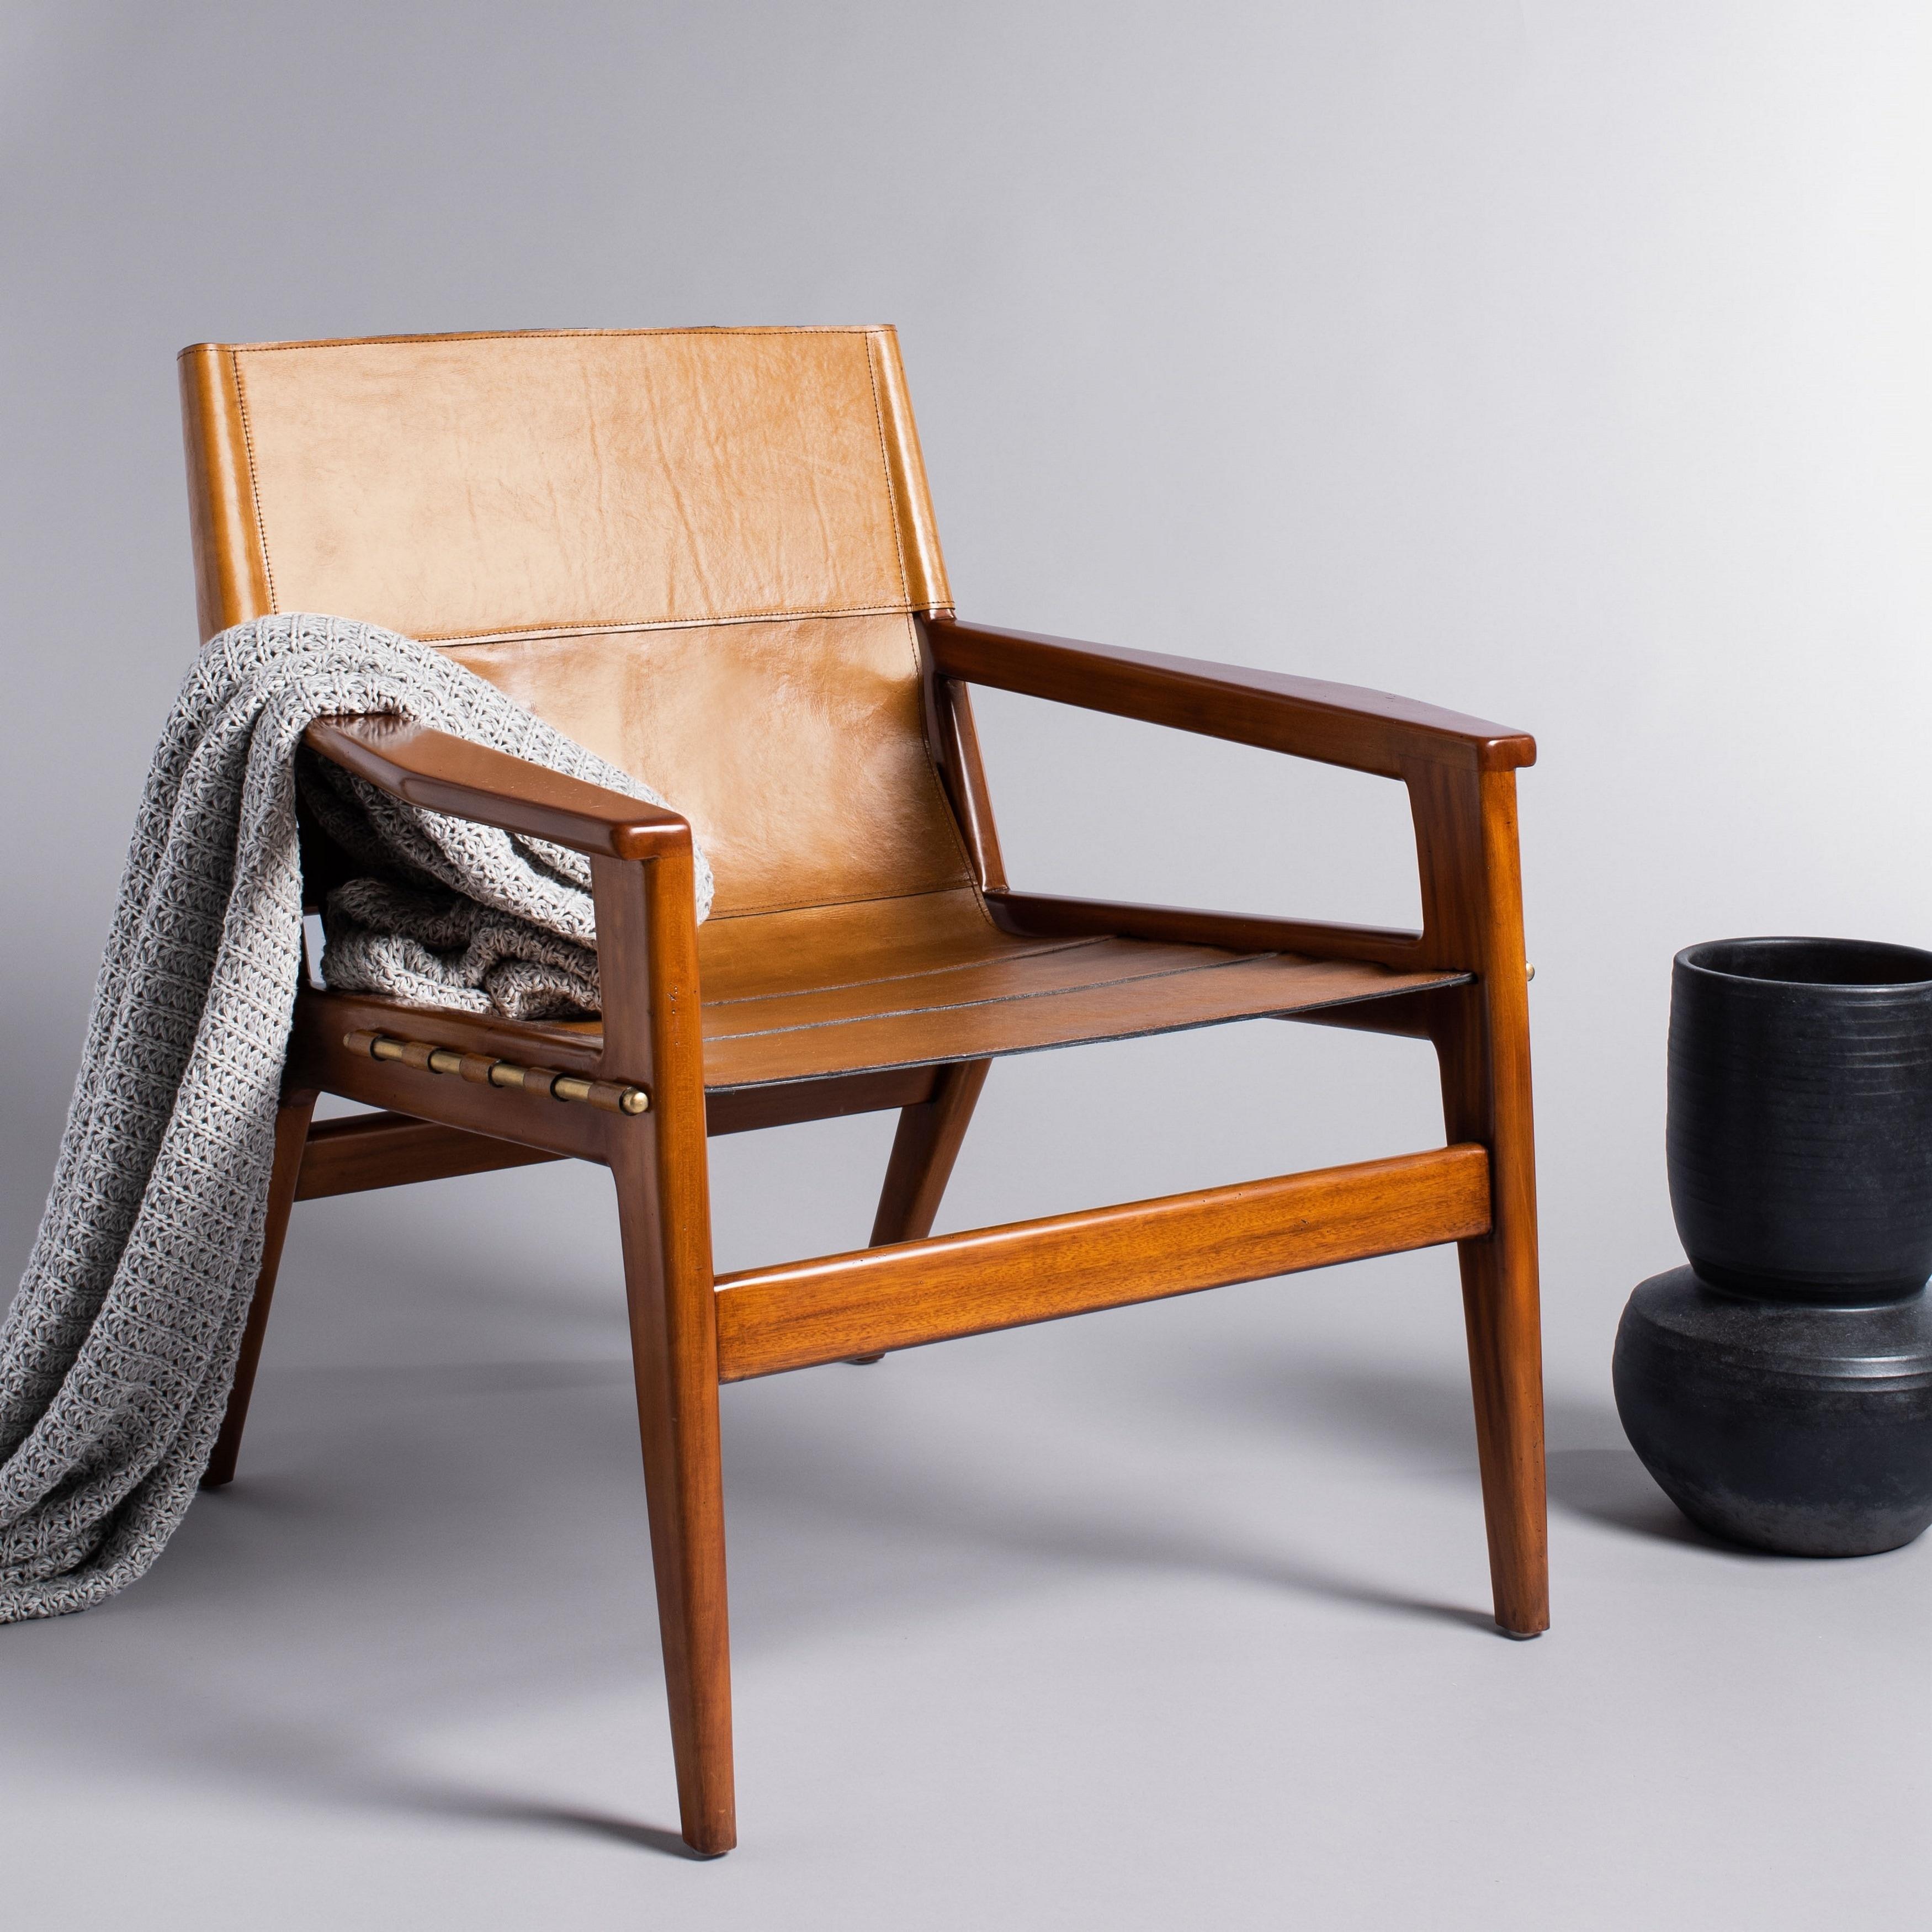 Culkin Leather Sling Chair